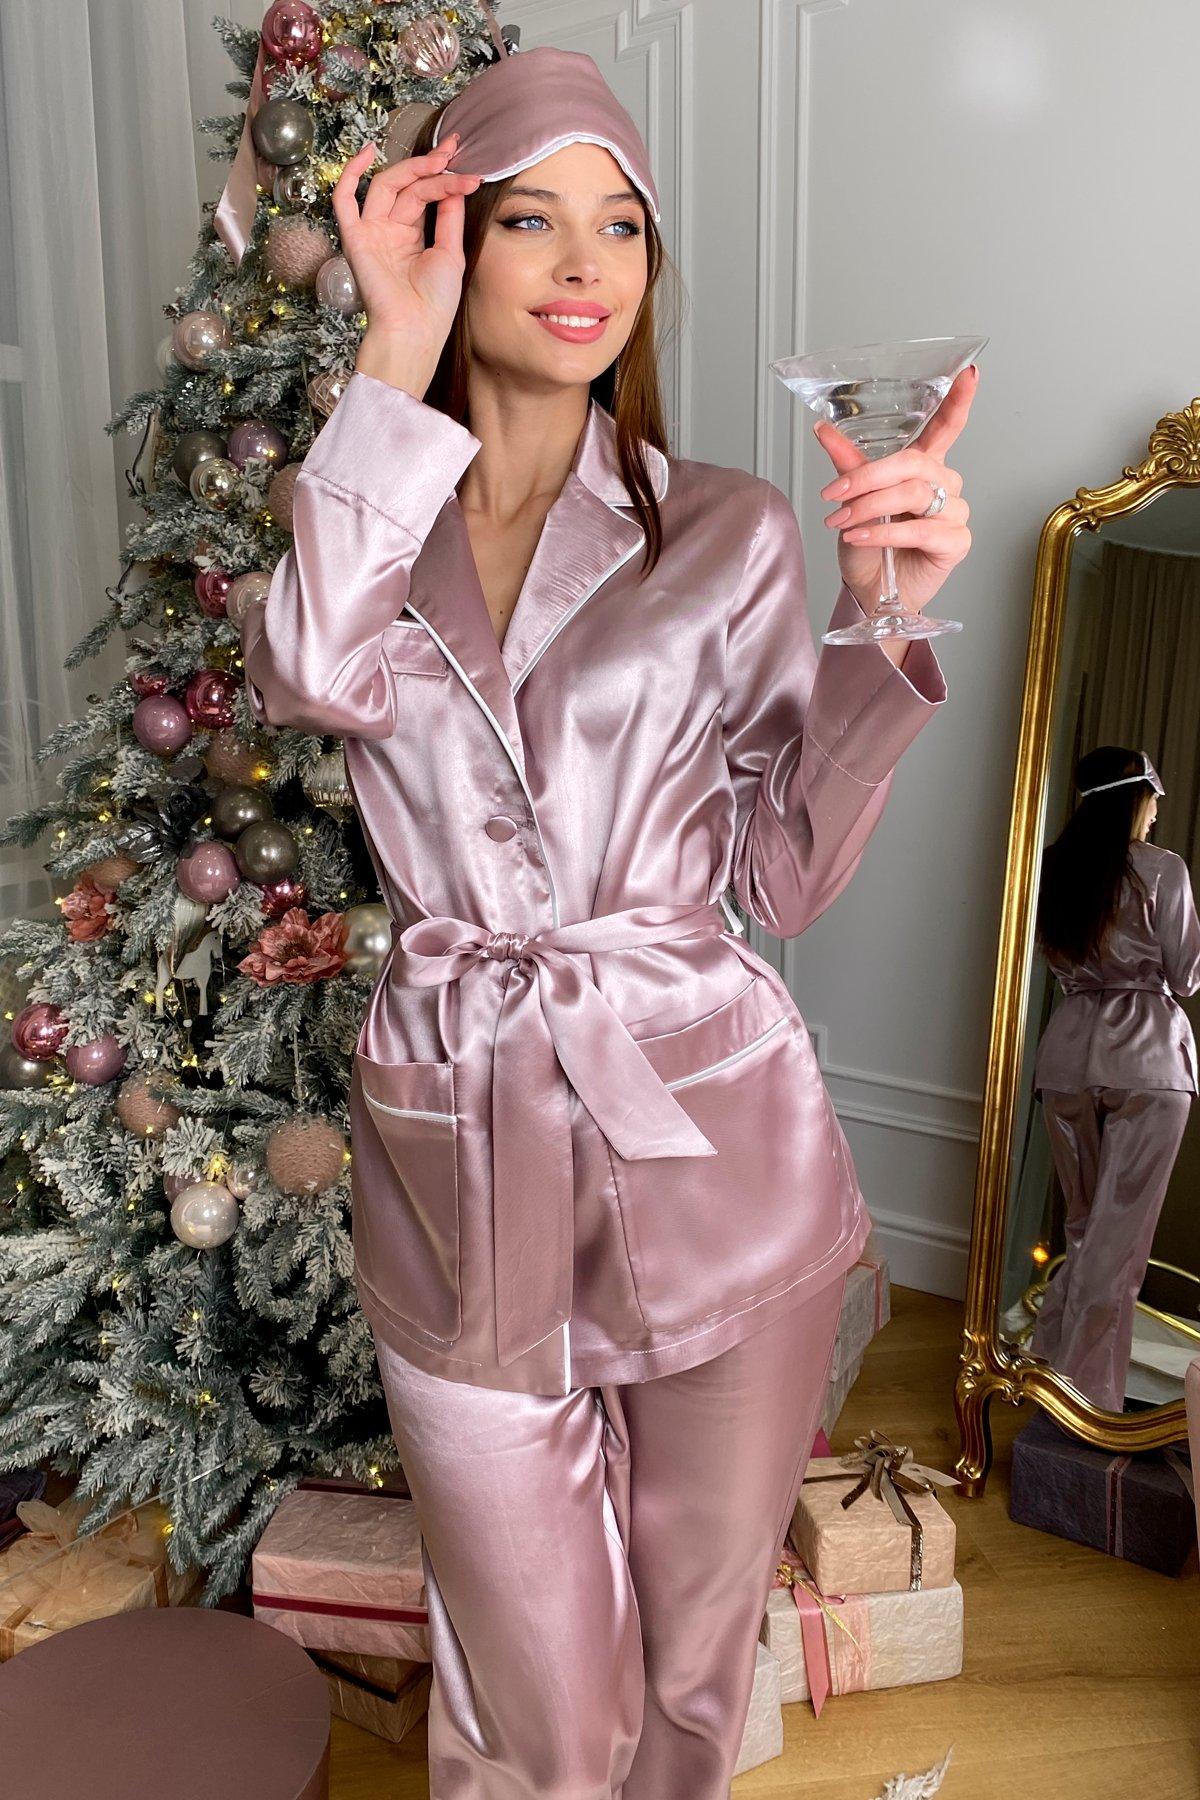 Шайн пижама из шелка 10446 АРТ. 46759 Цвет: Пудра - фото 5, интернет магазин tm-modus.ru